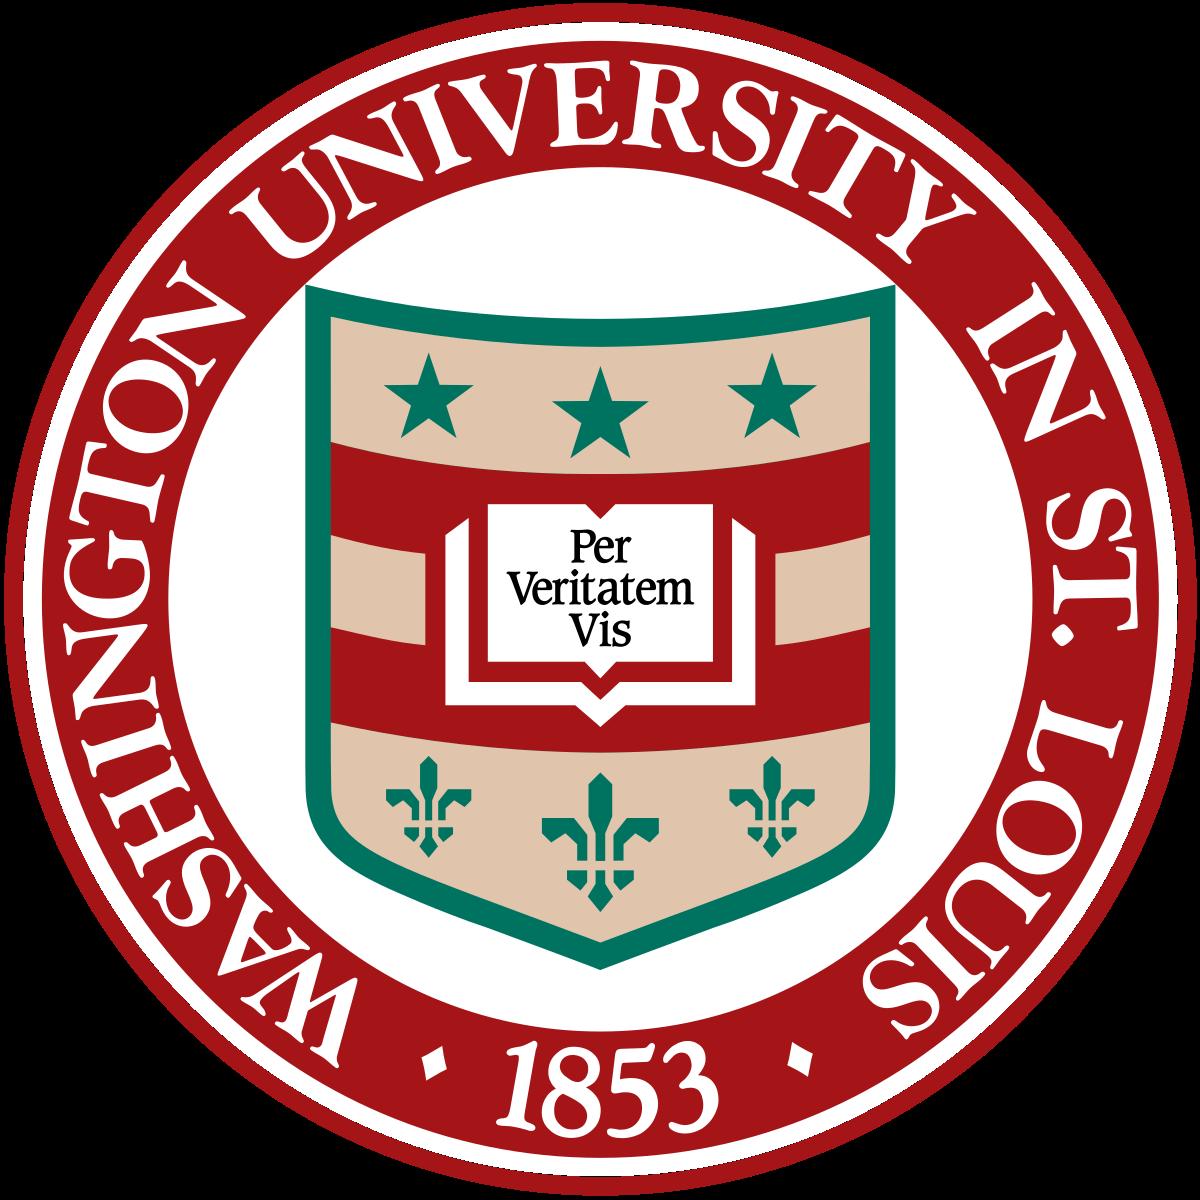 Clipart university of washington football png library stock Washington University in St. Louis - Wikipedia png library stock